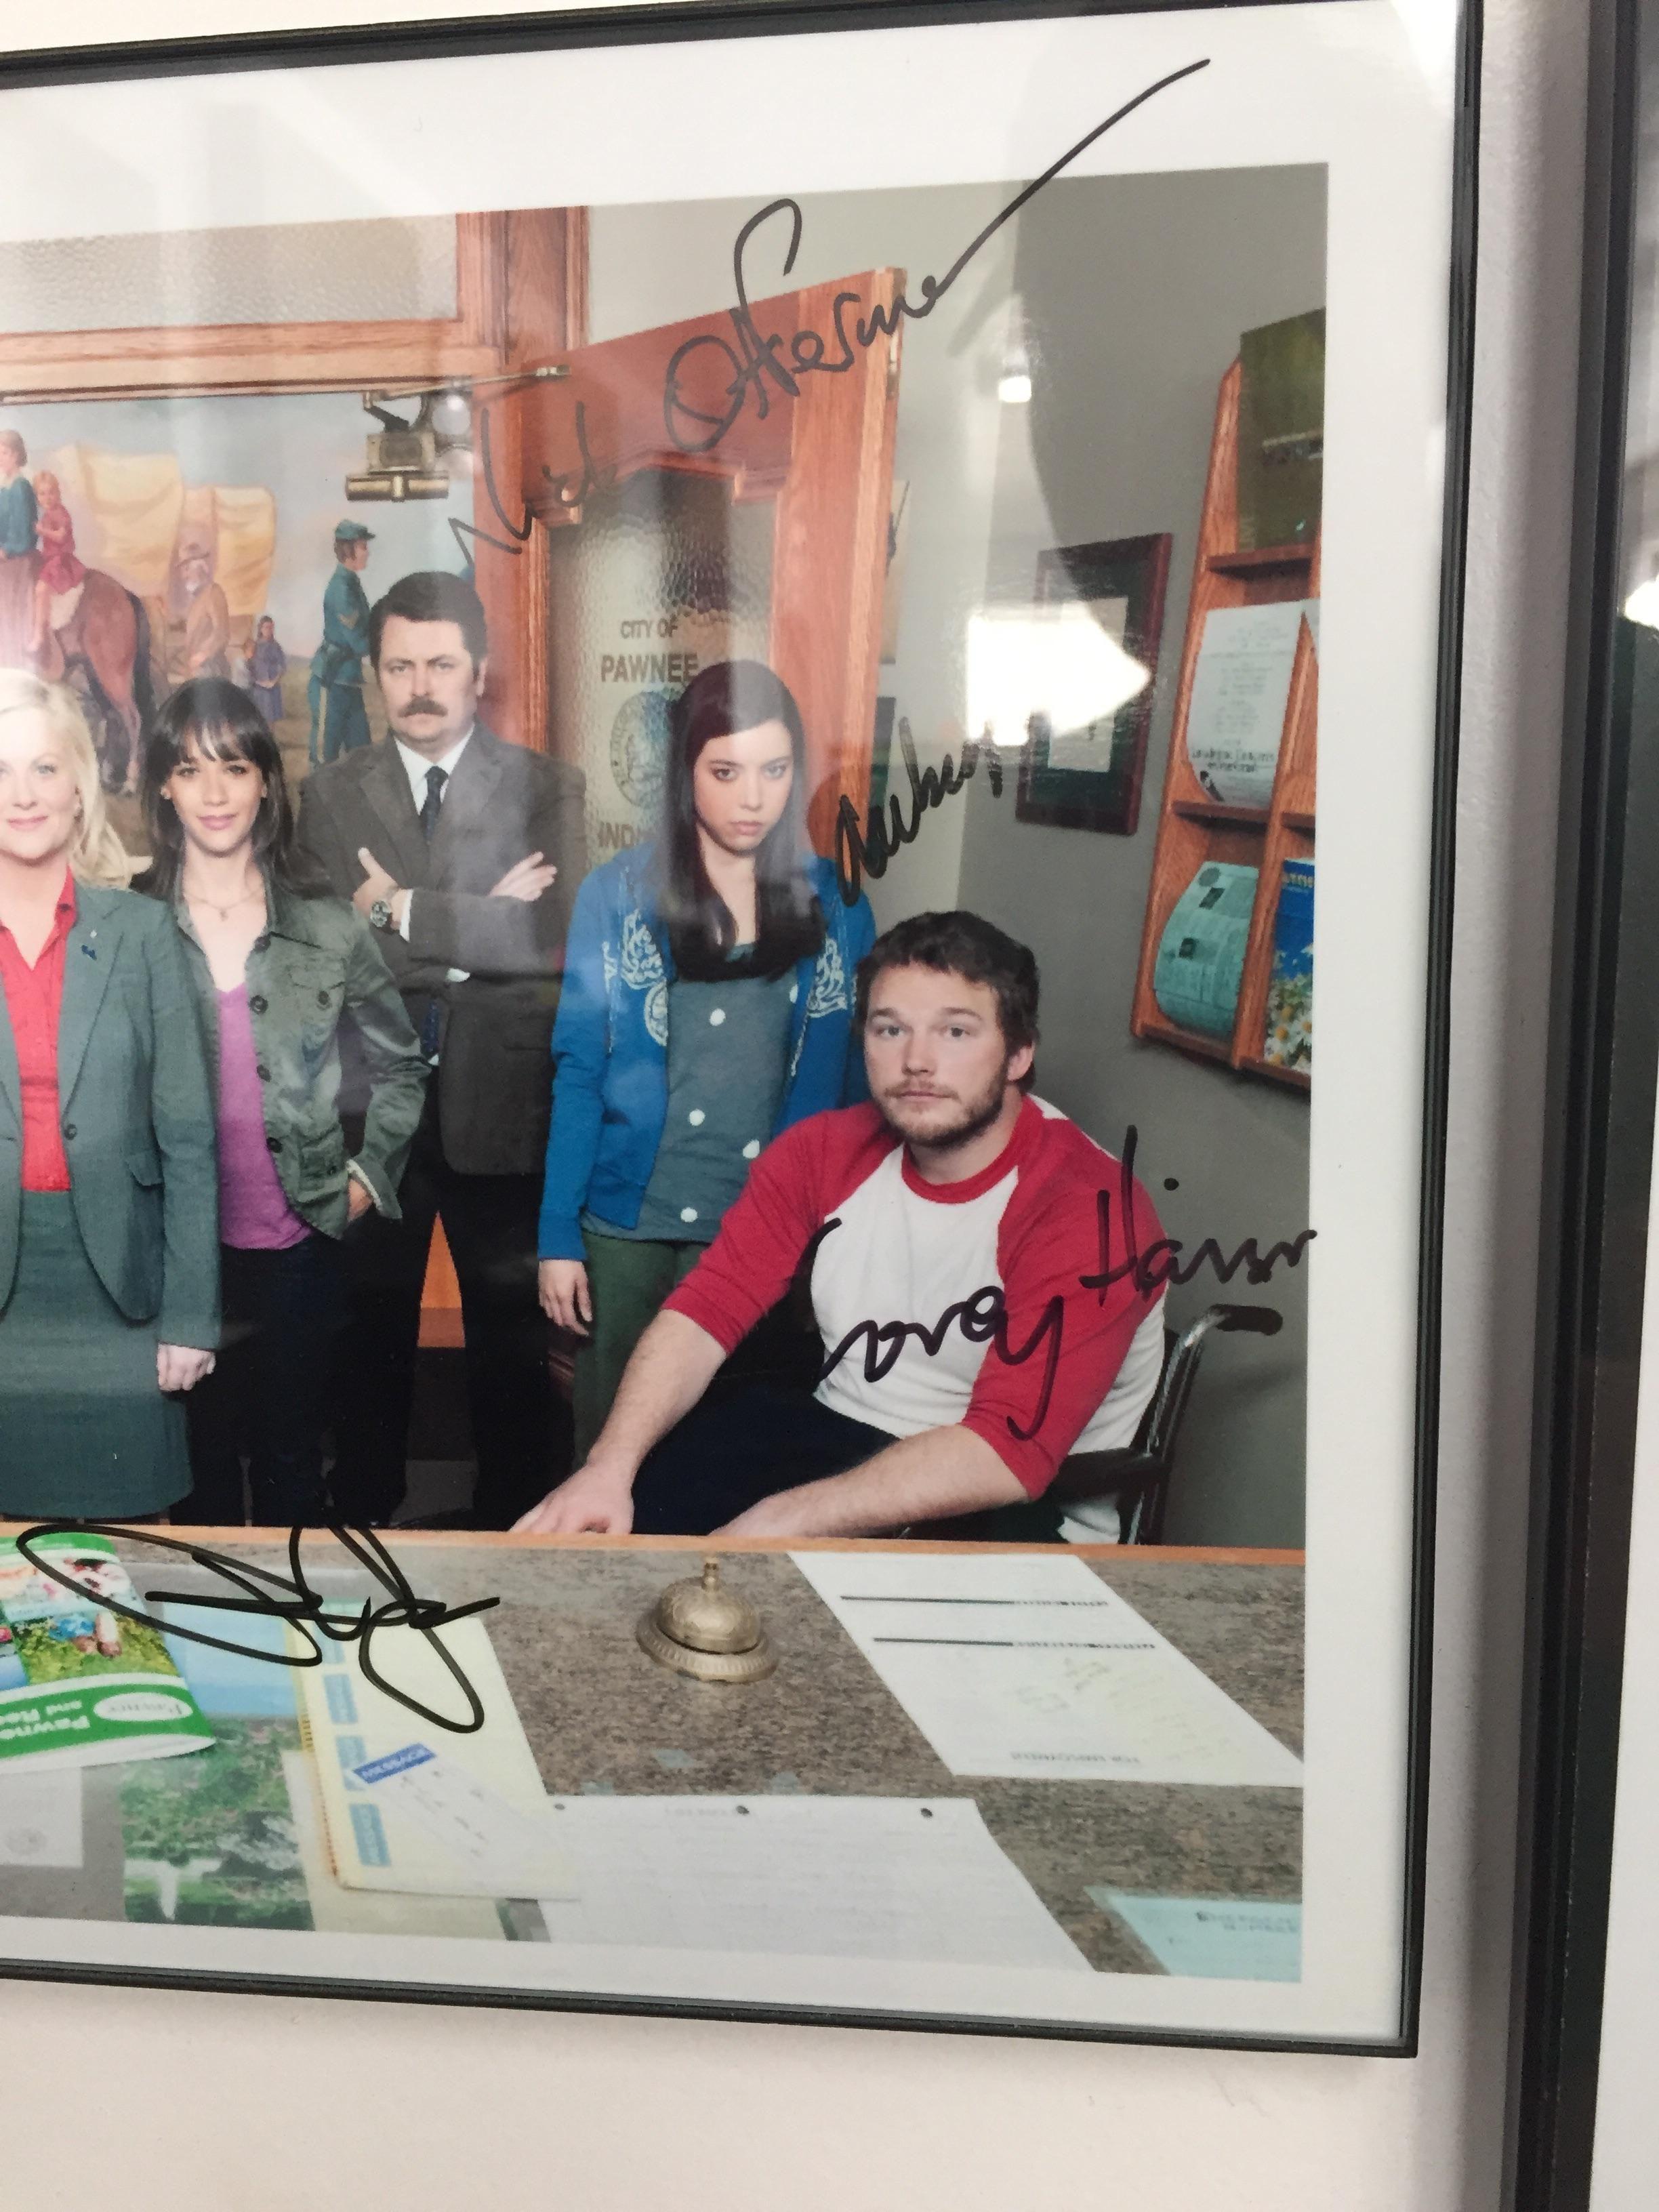 Chris Pratt signed this autograph as Corey Haim.